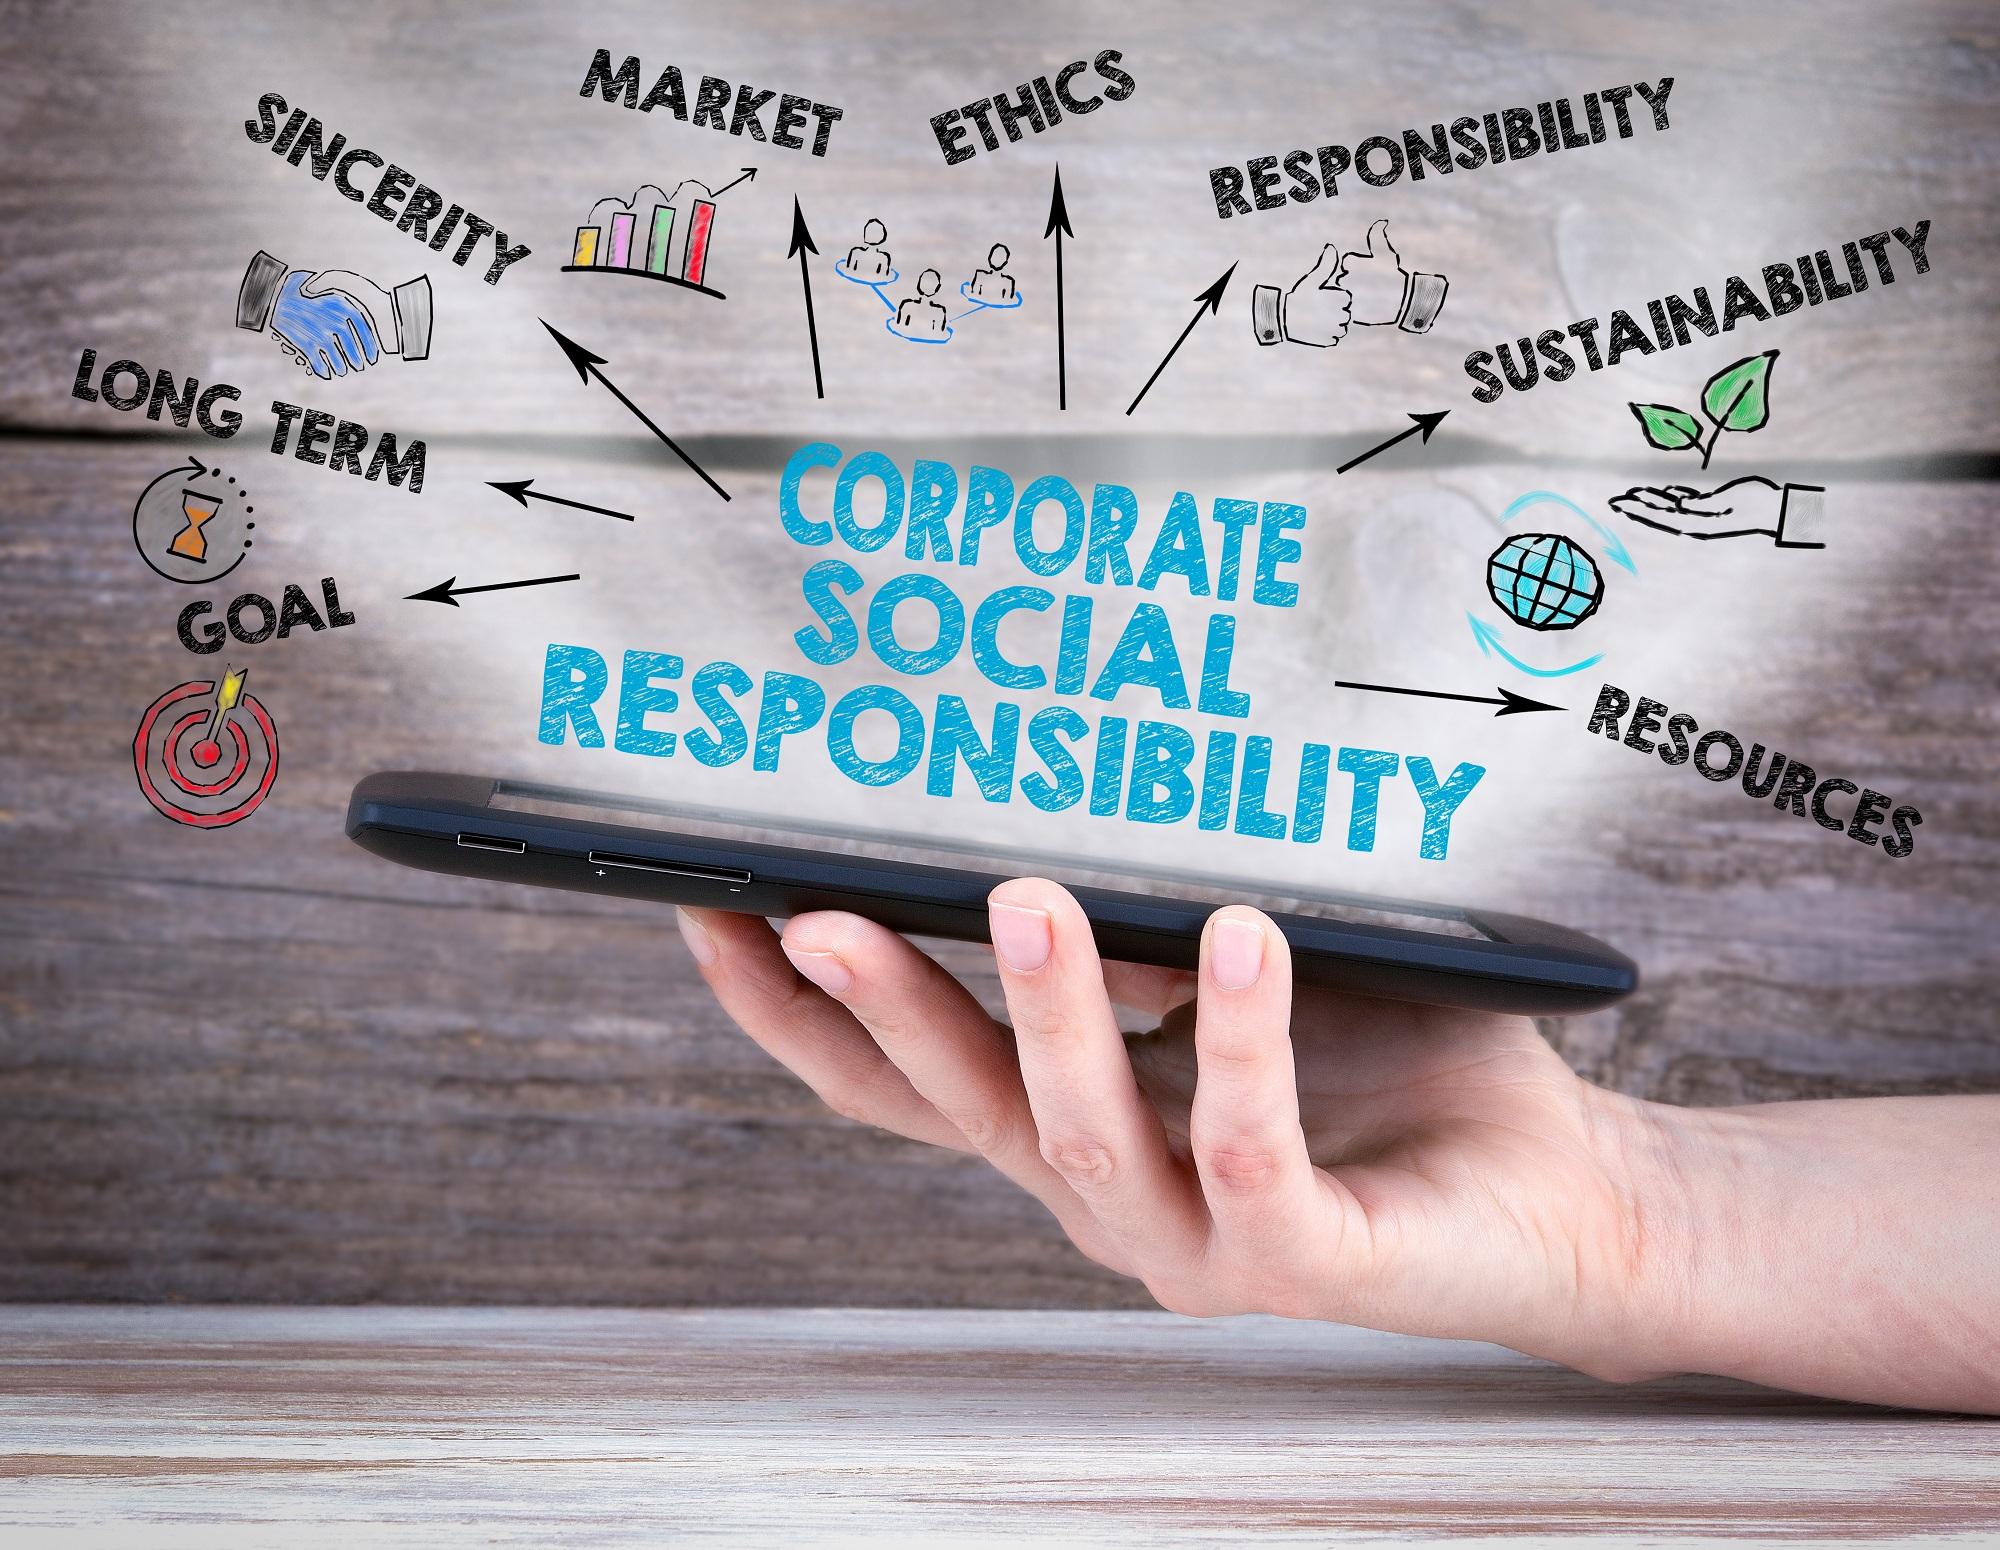 5 handfeste Argumente für Corporate Social Responsibility